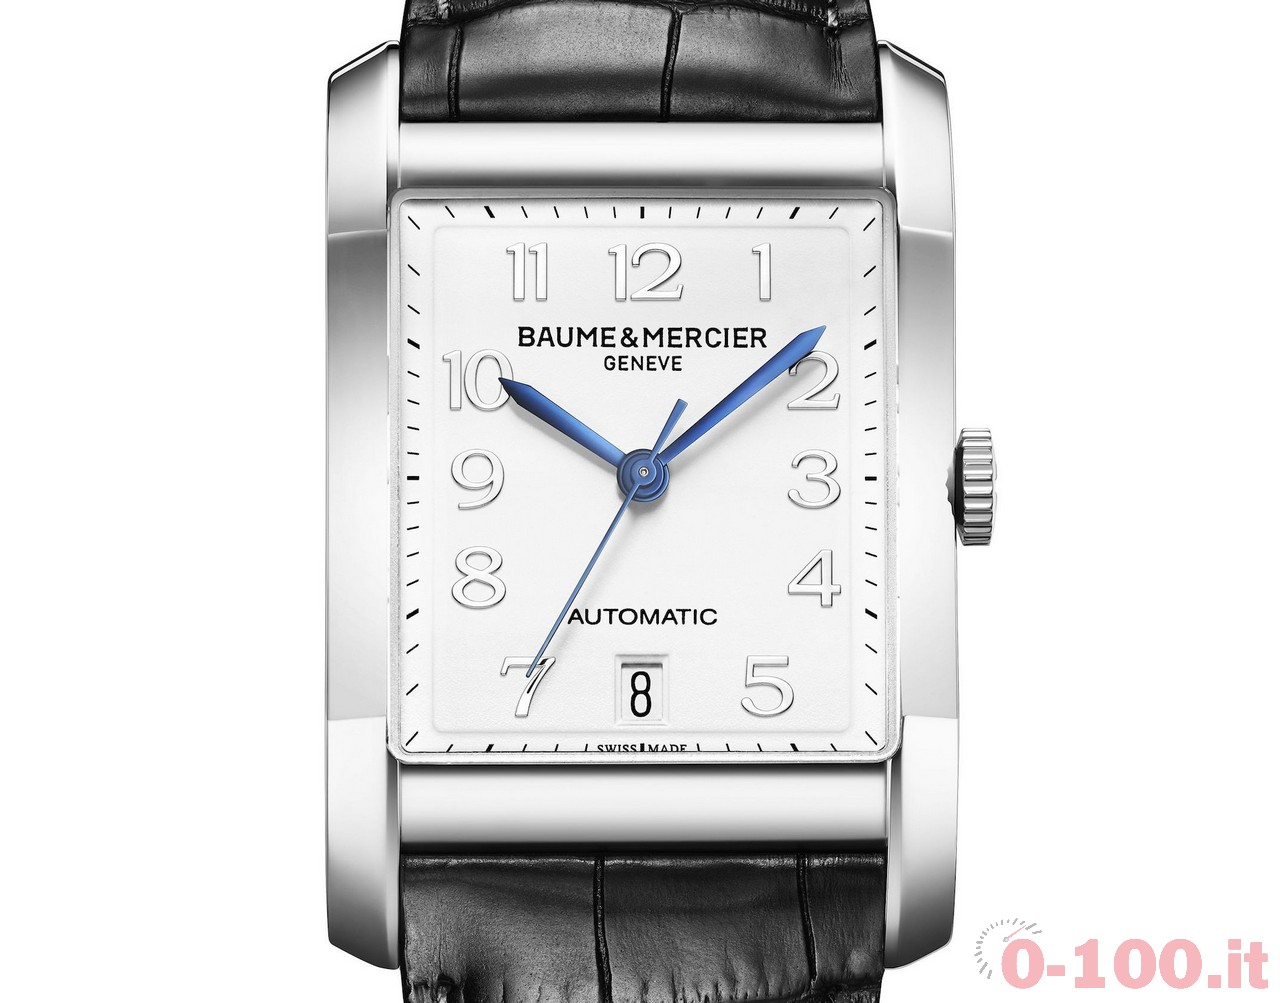 anteprima-sihh-2015-baume-mercier-hampton-automatico-ref-m0a10155-ref-m0a10156_0-100_3